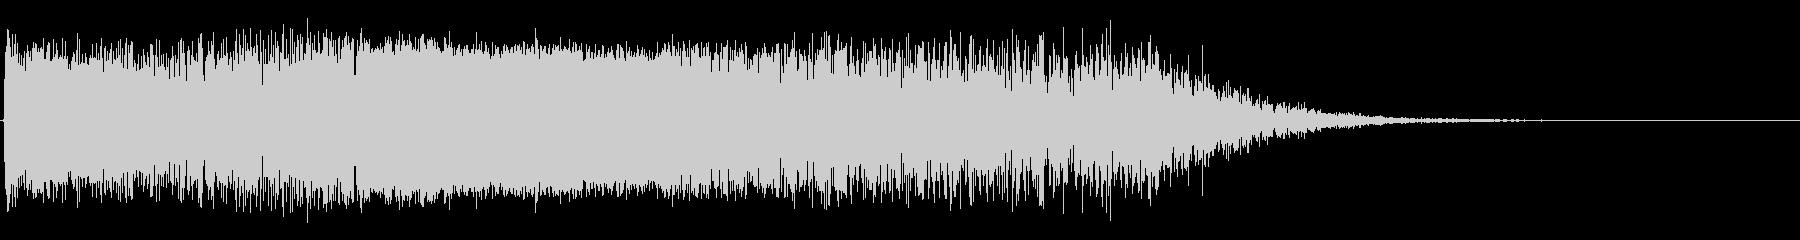 SynthSweep EC03_34_1の未再生の波形